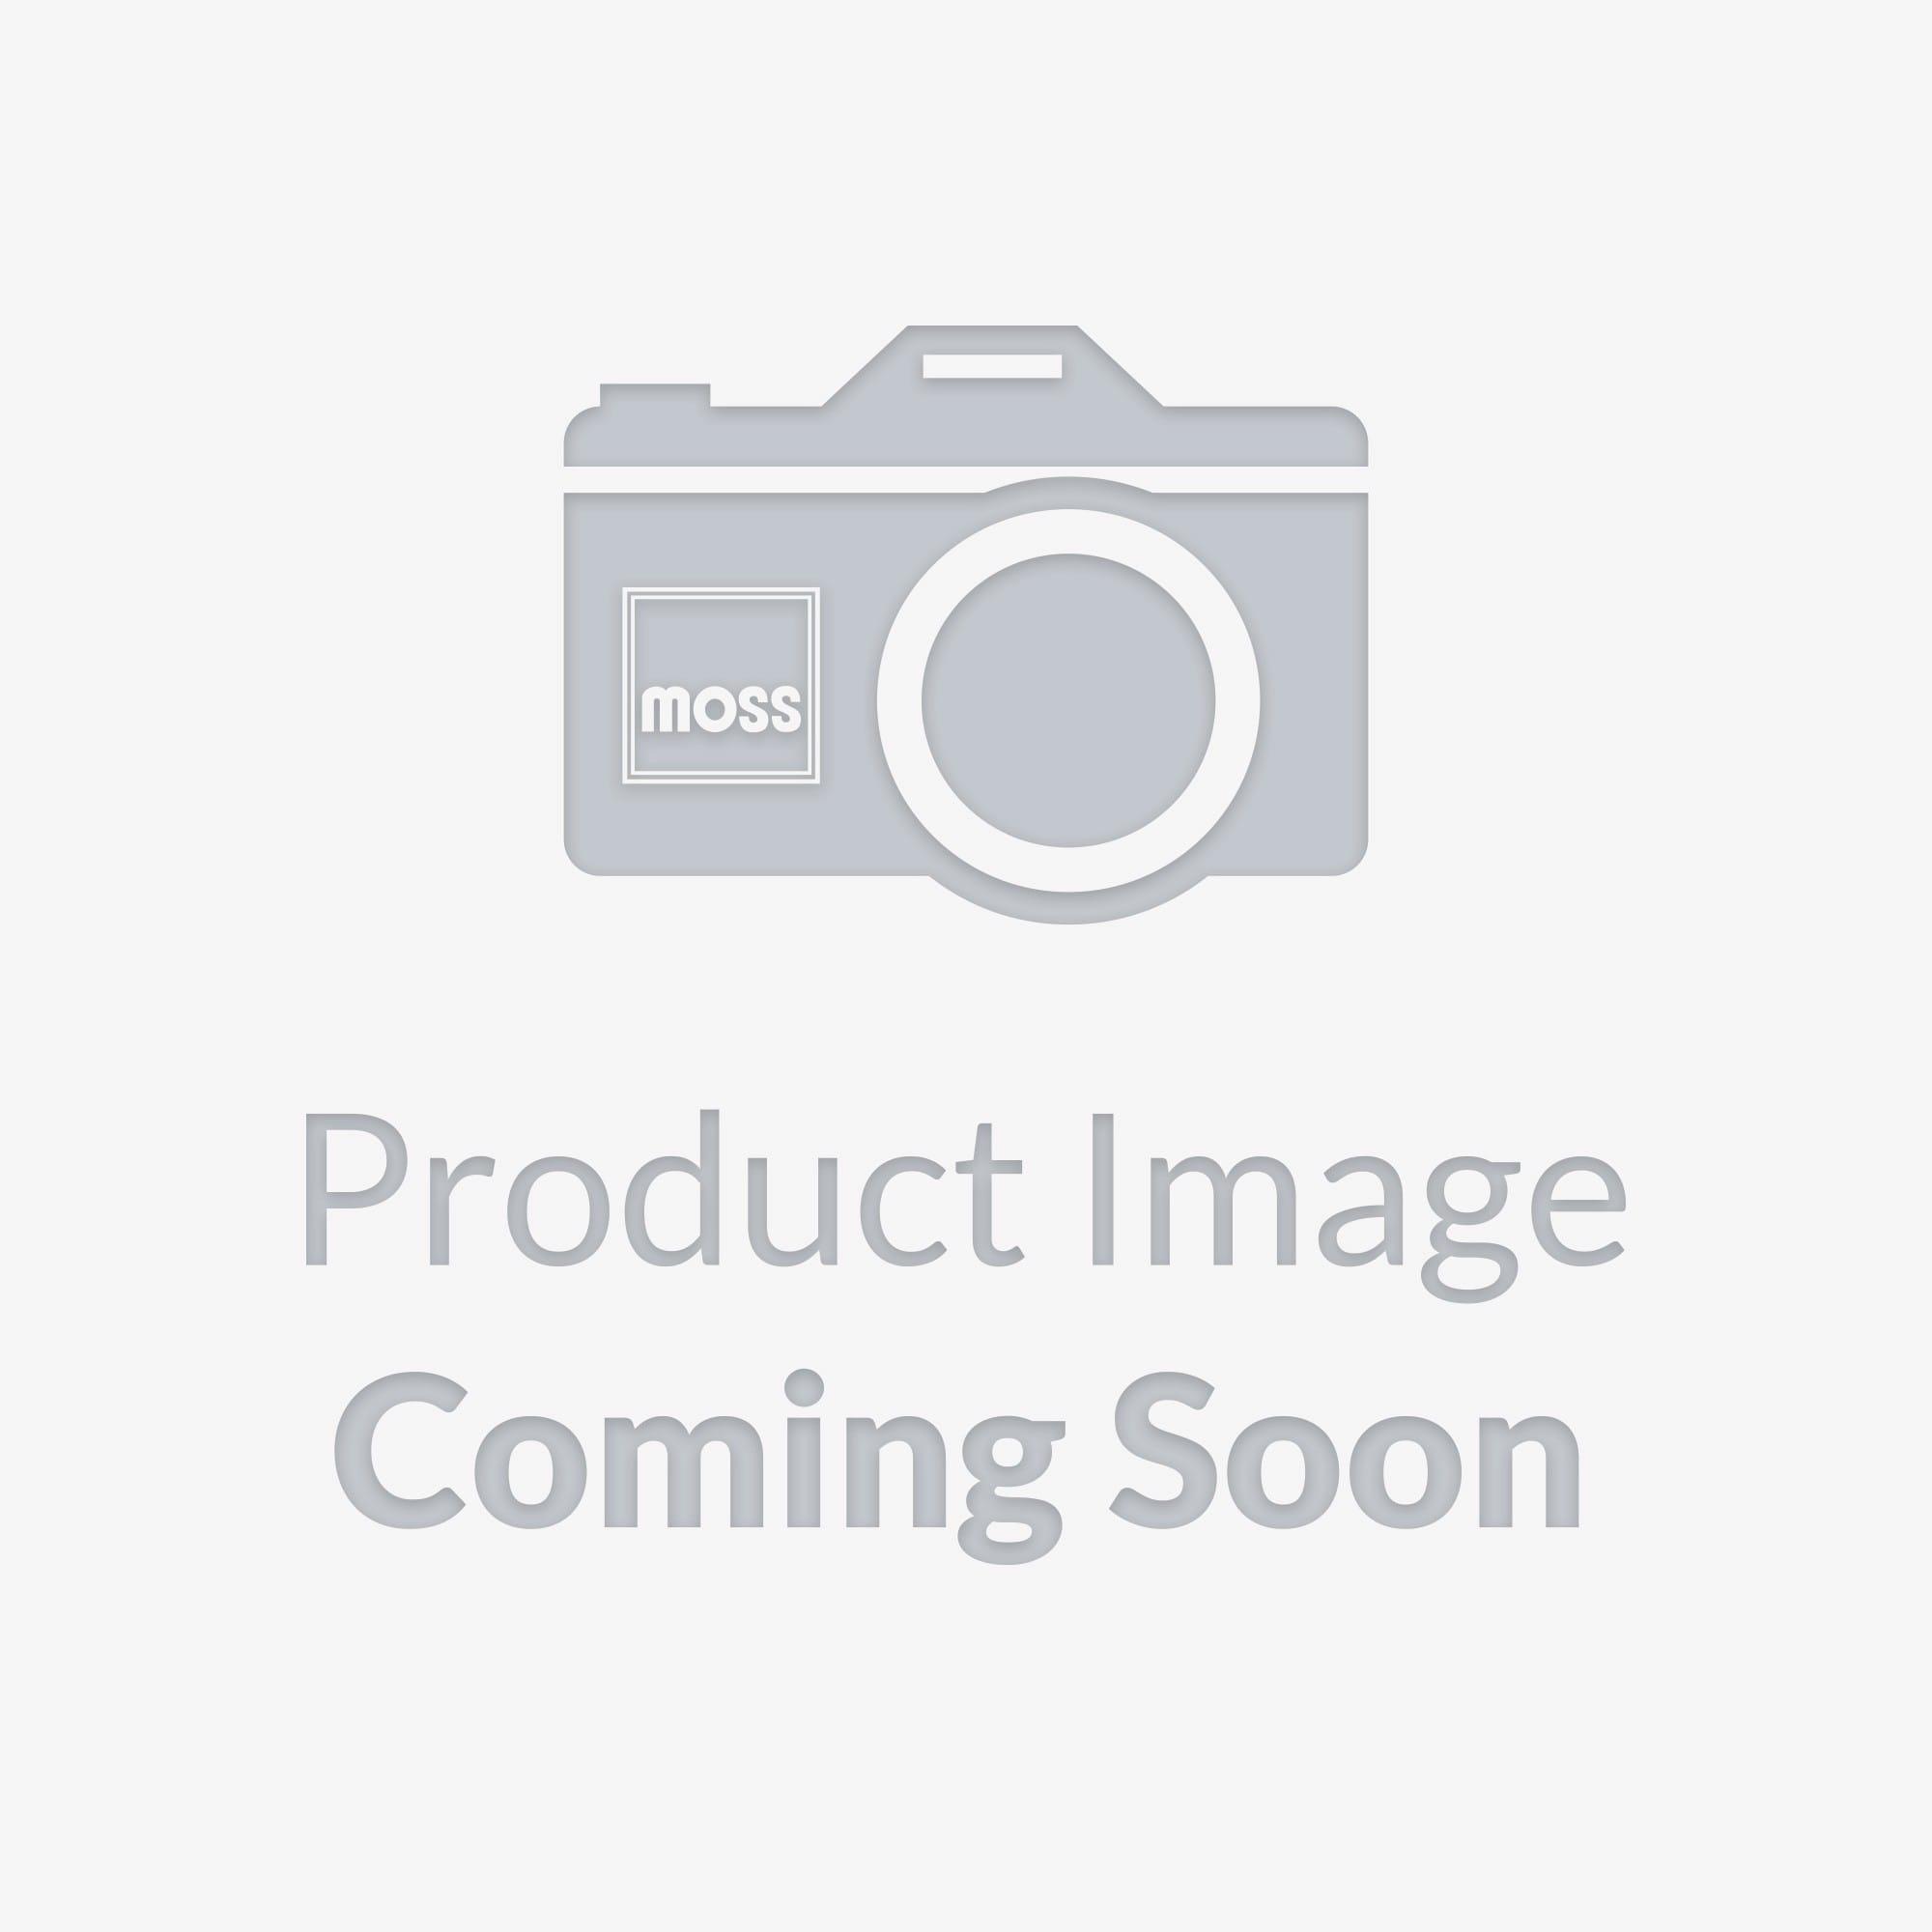 111 708 Complete Interior Kit Autumn Leaf Mgb Roadster Moss Motors